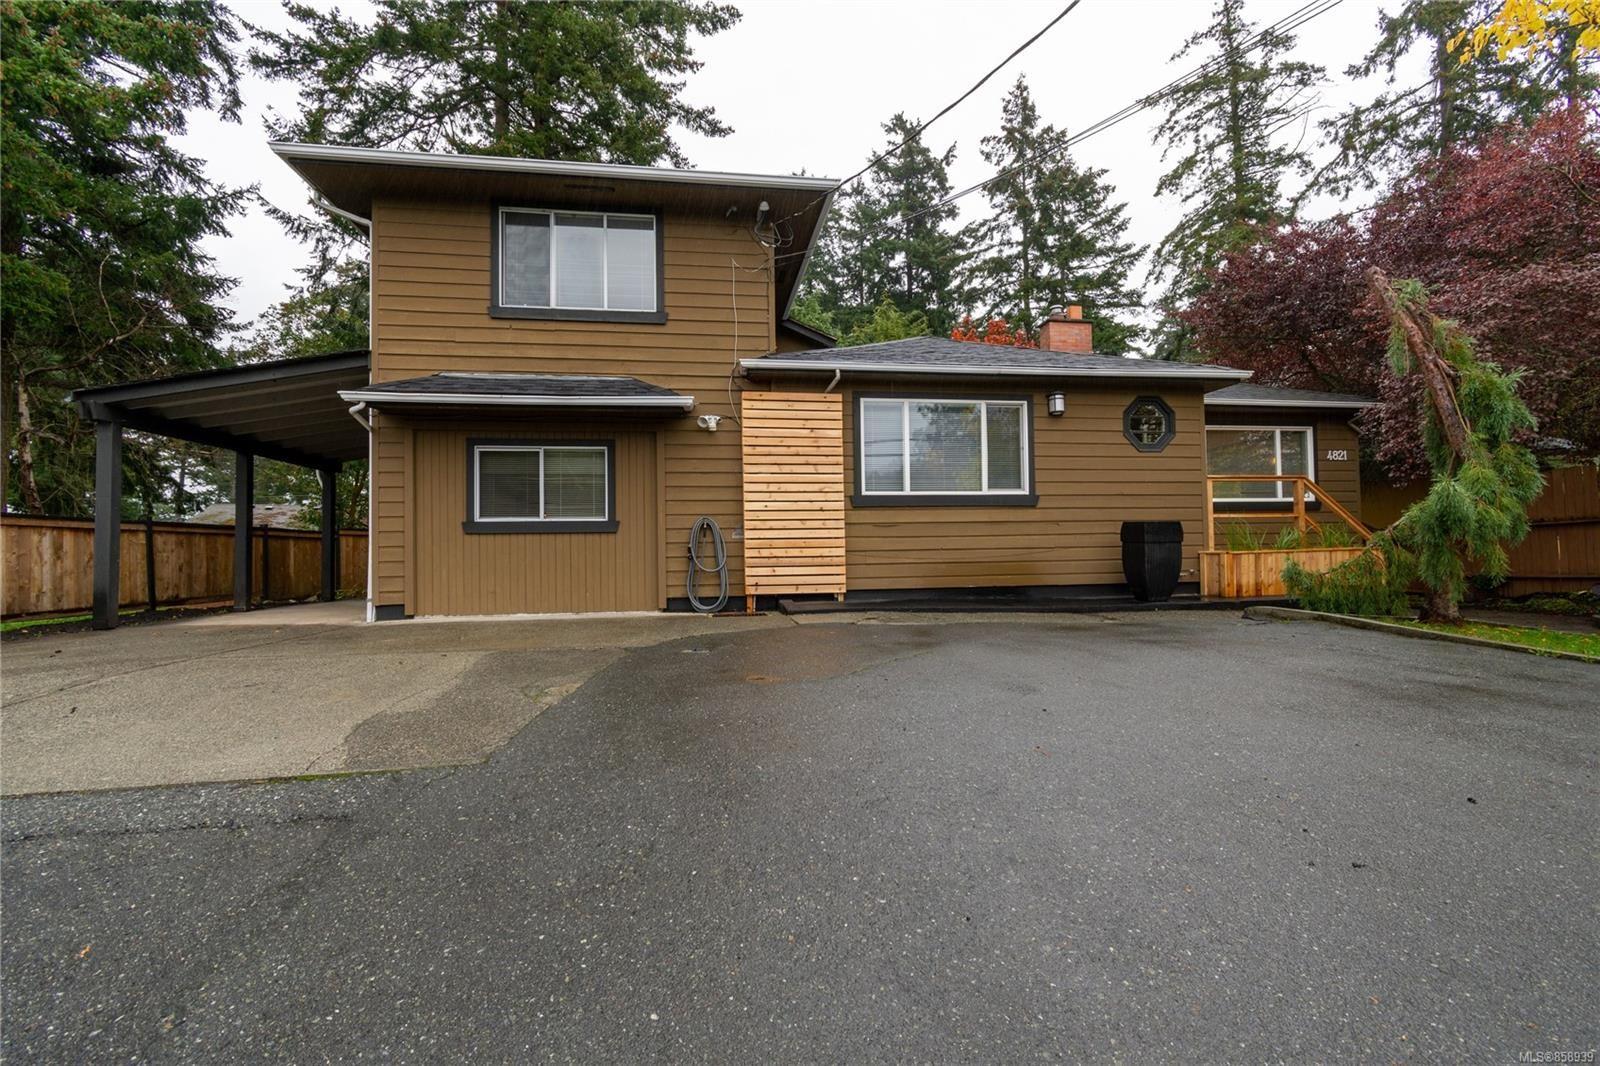 Main Photo: 4821 Cordova Bay Rd in : SE Cordova Bay House for sale (Saanich East)  : MLS®# 858939